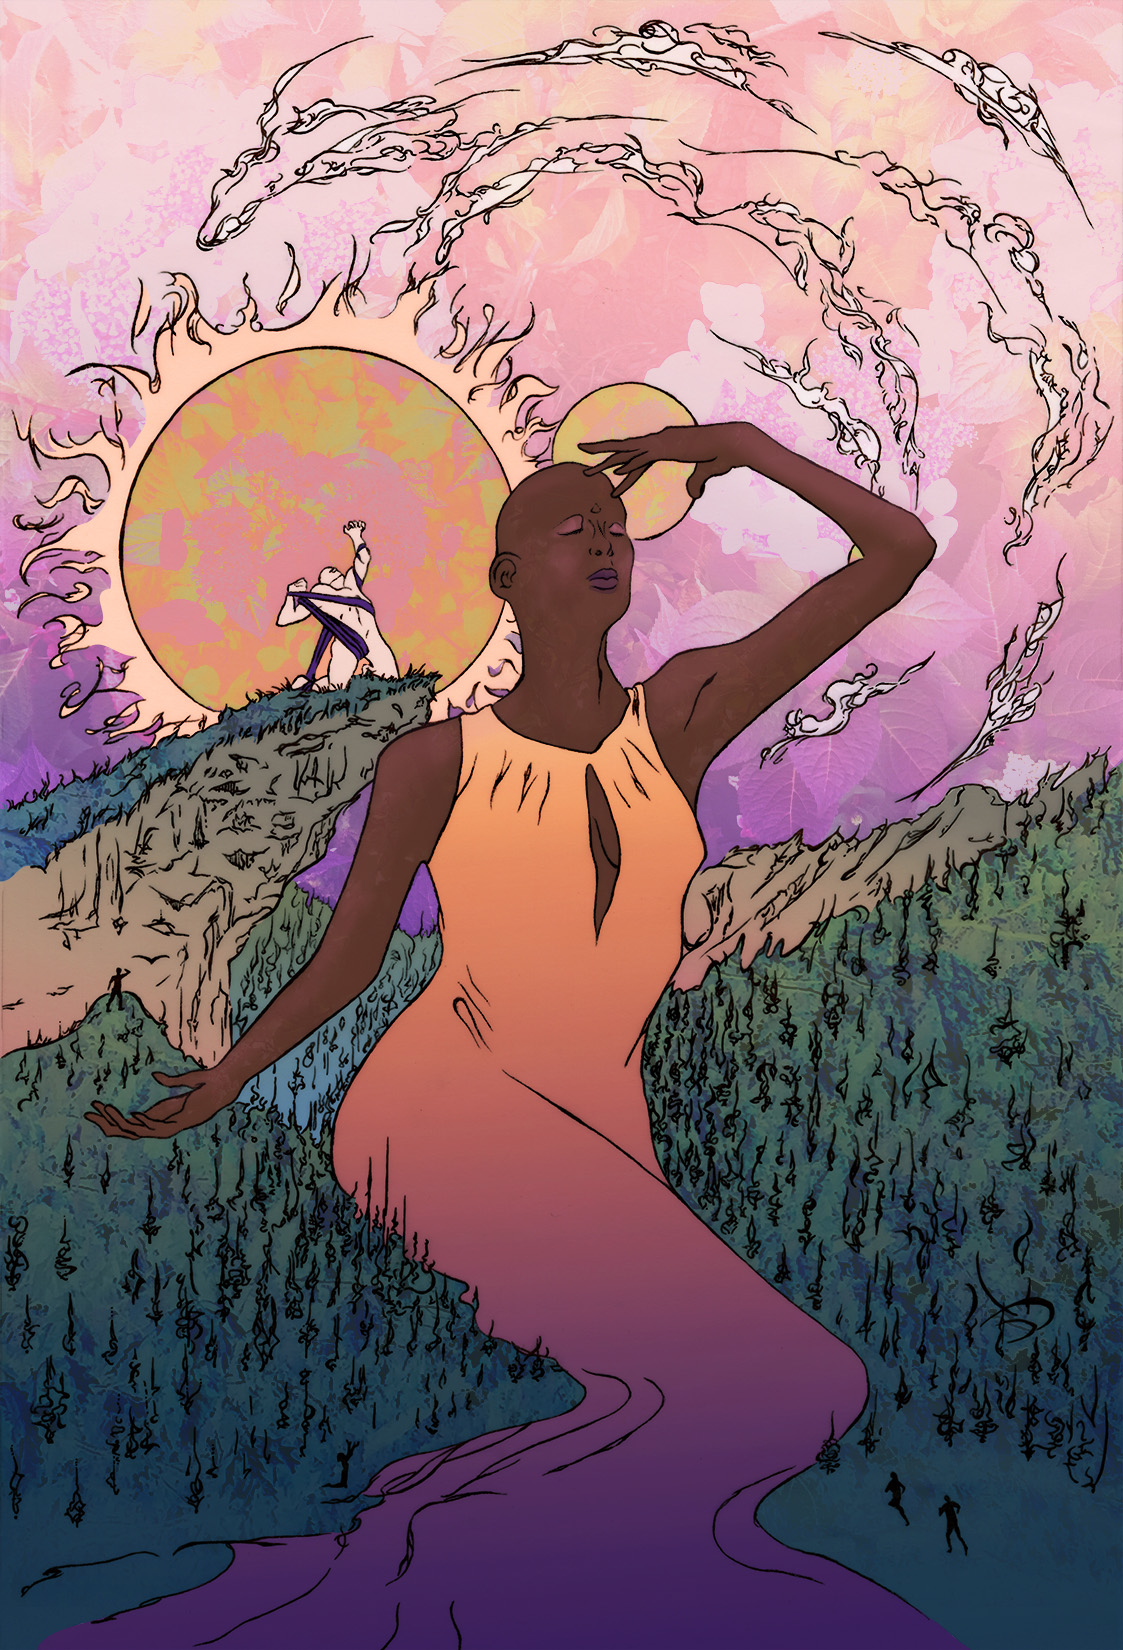 Hercules student artwork from MassArt, St. Paul